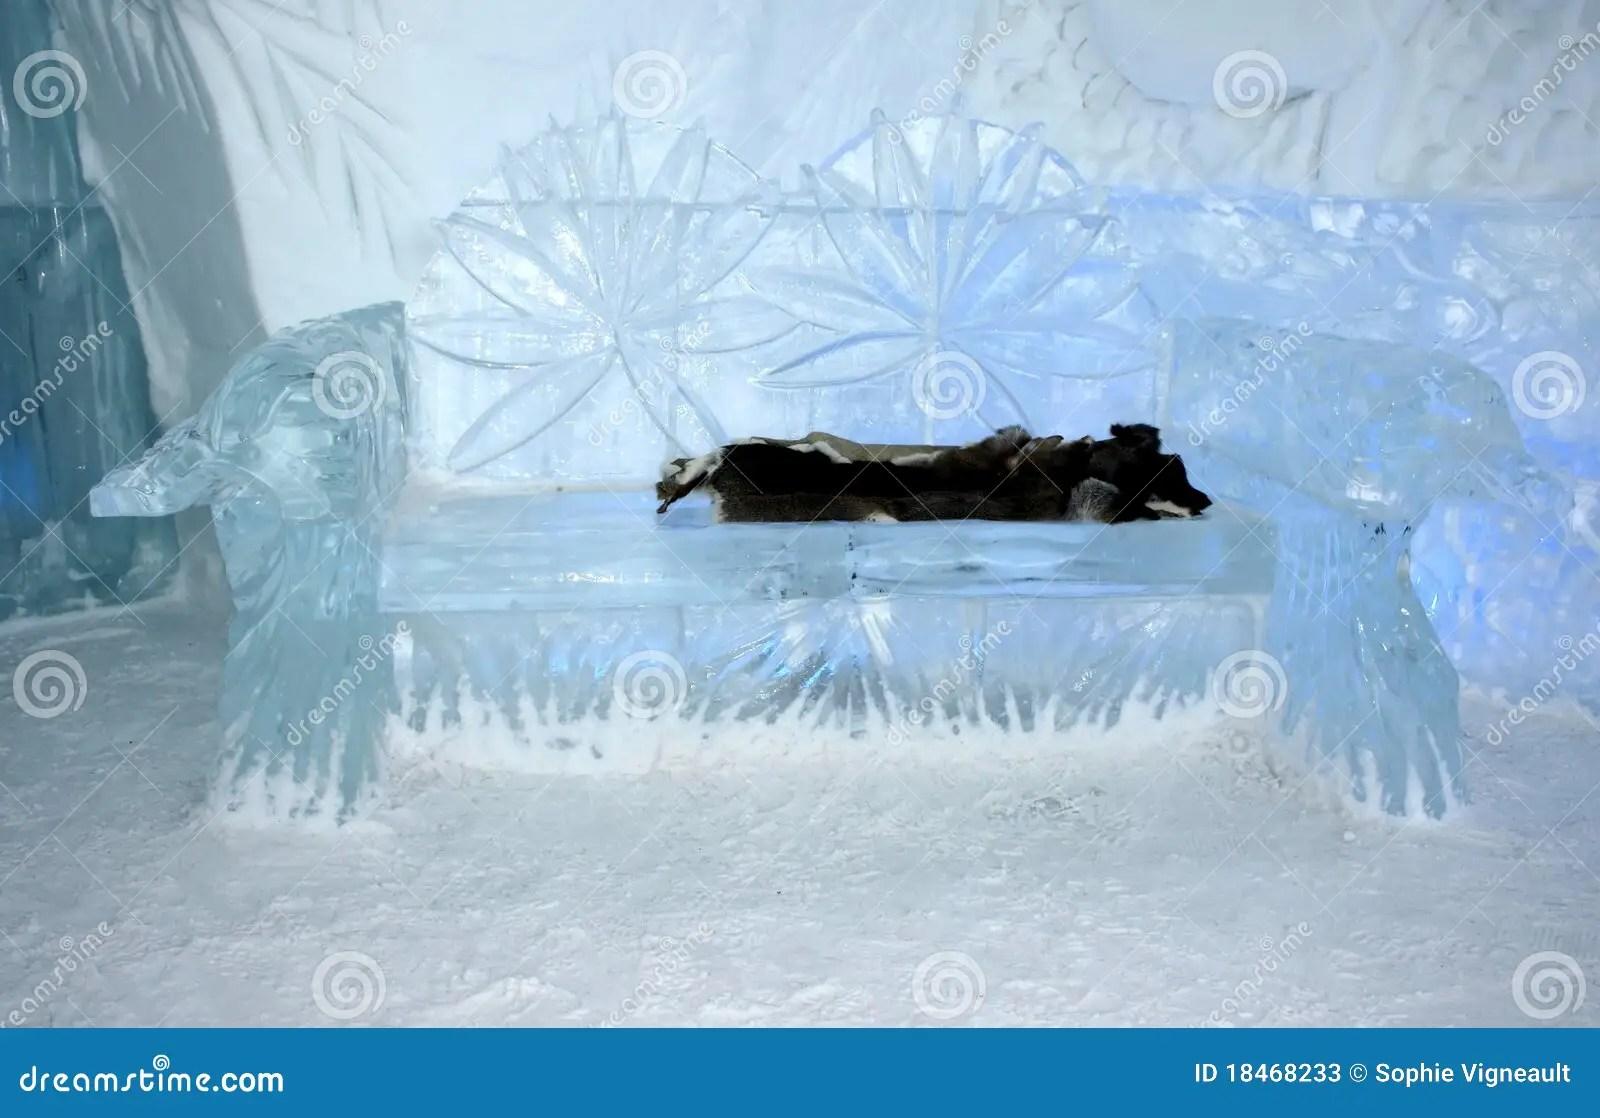 Quebec Ice Hotel Interior Entrance Hall Editorial Stock Photo  Image 18468233